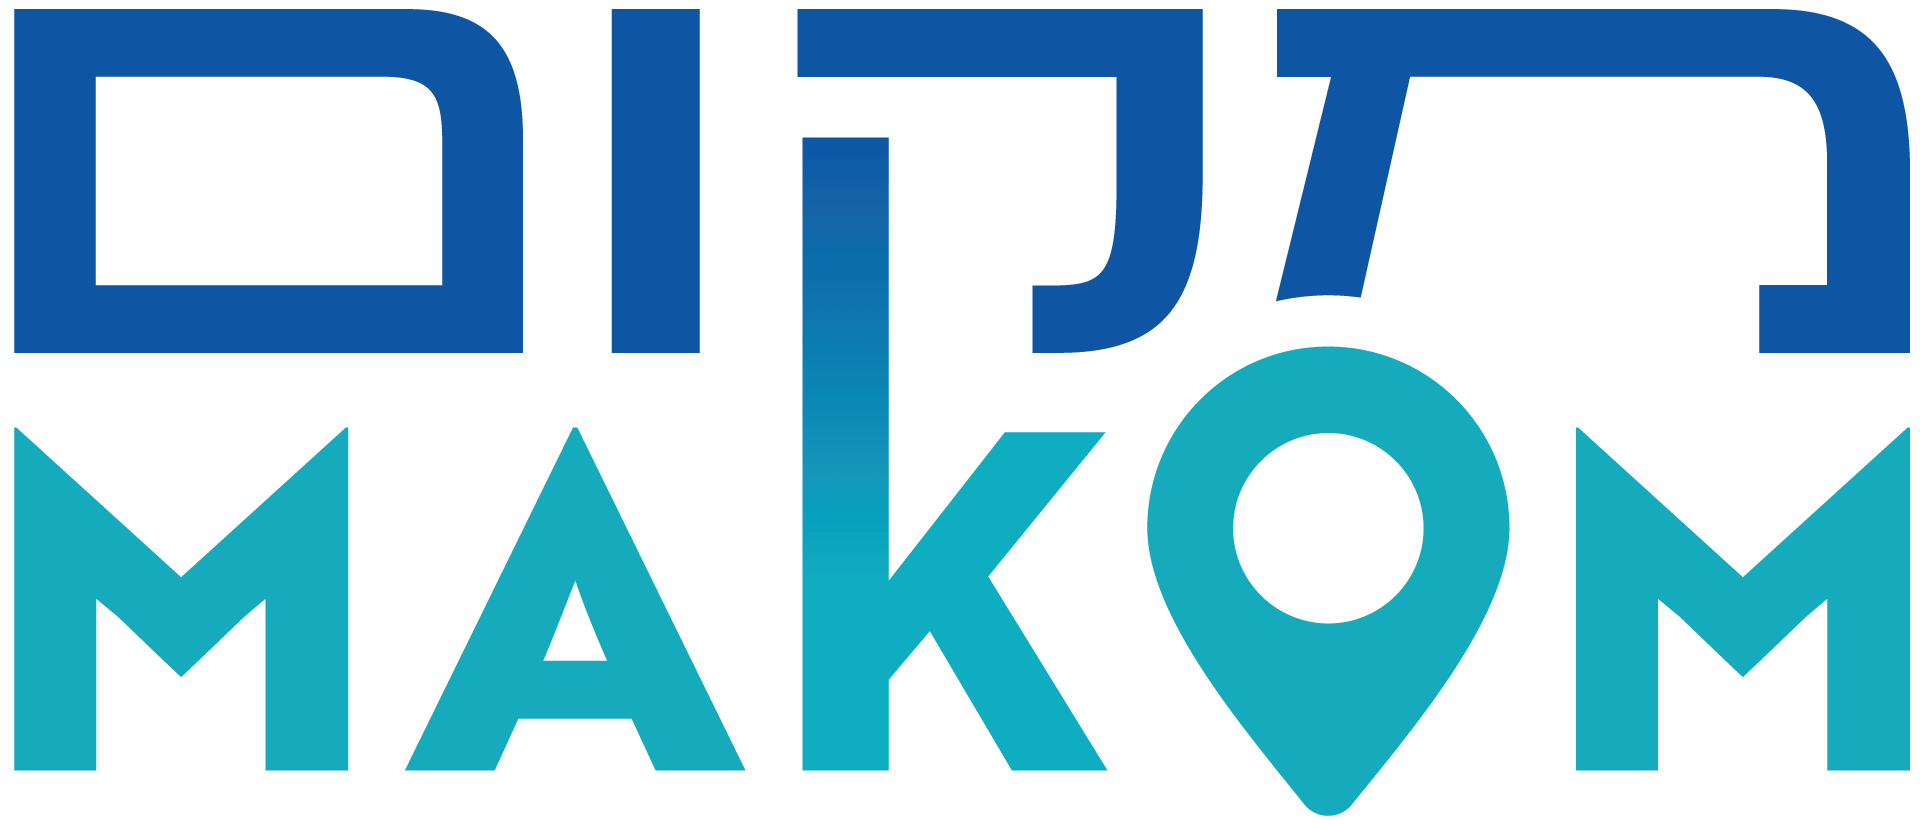 Makom Israel